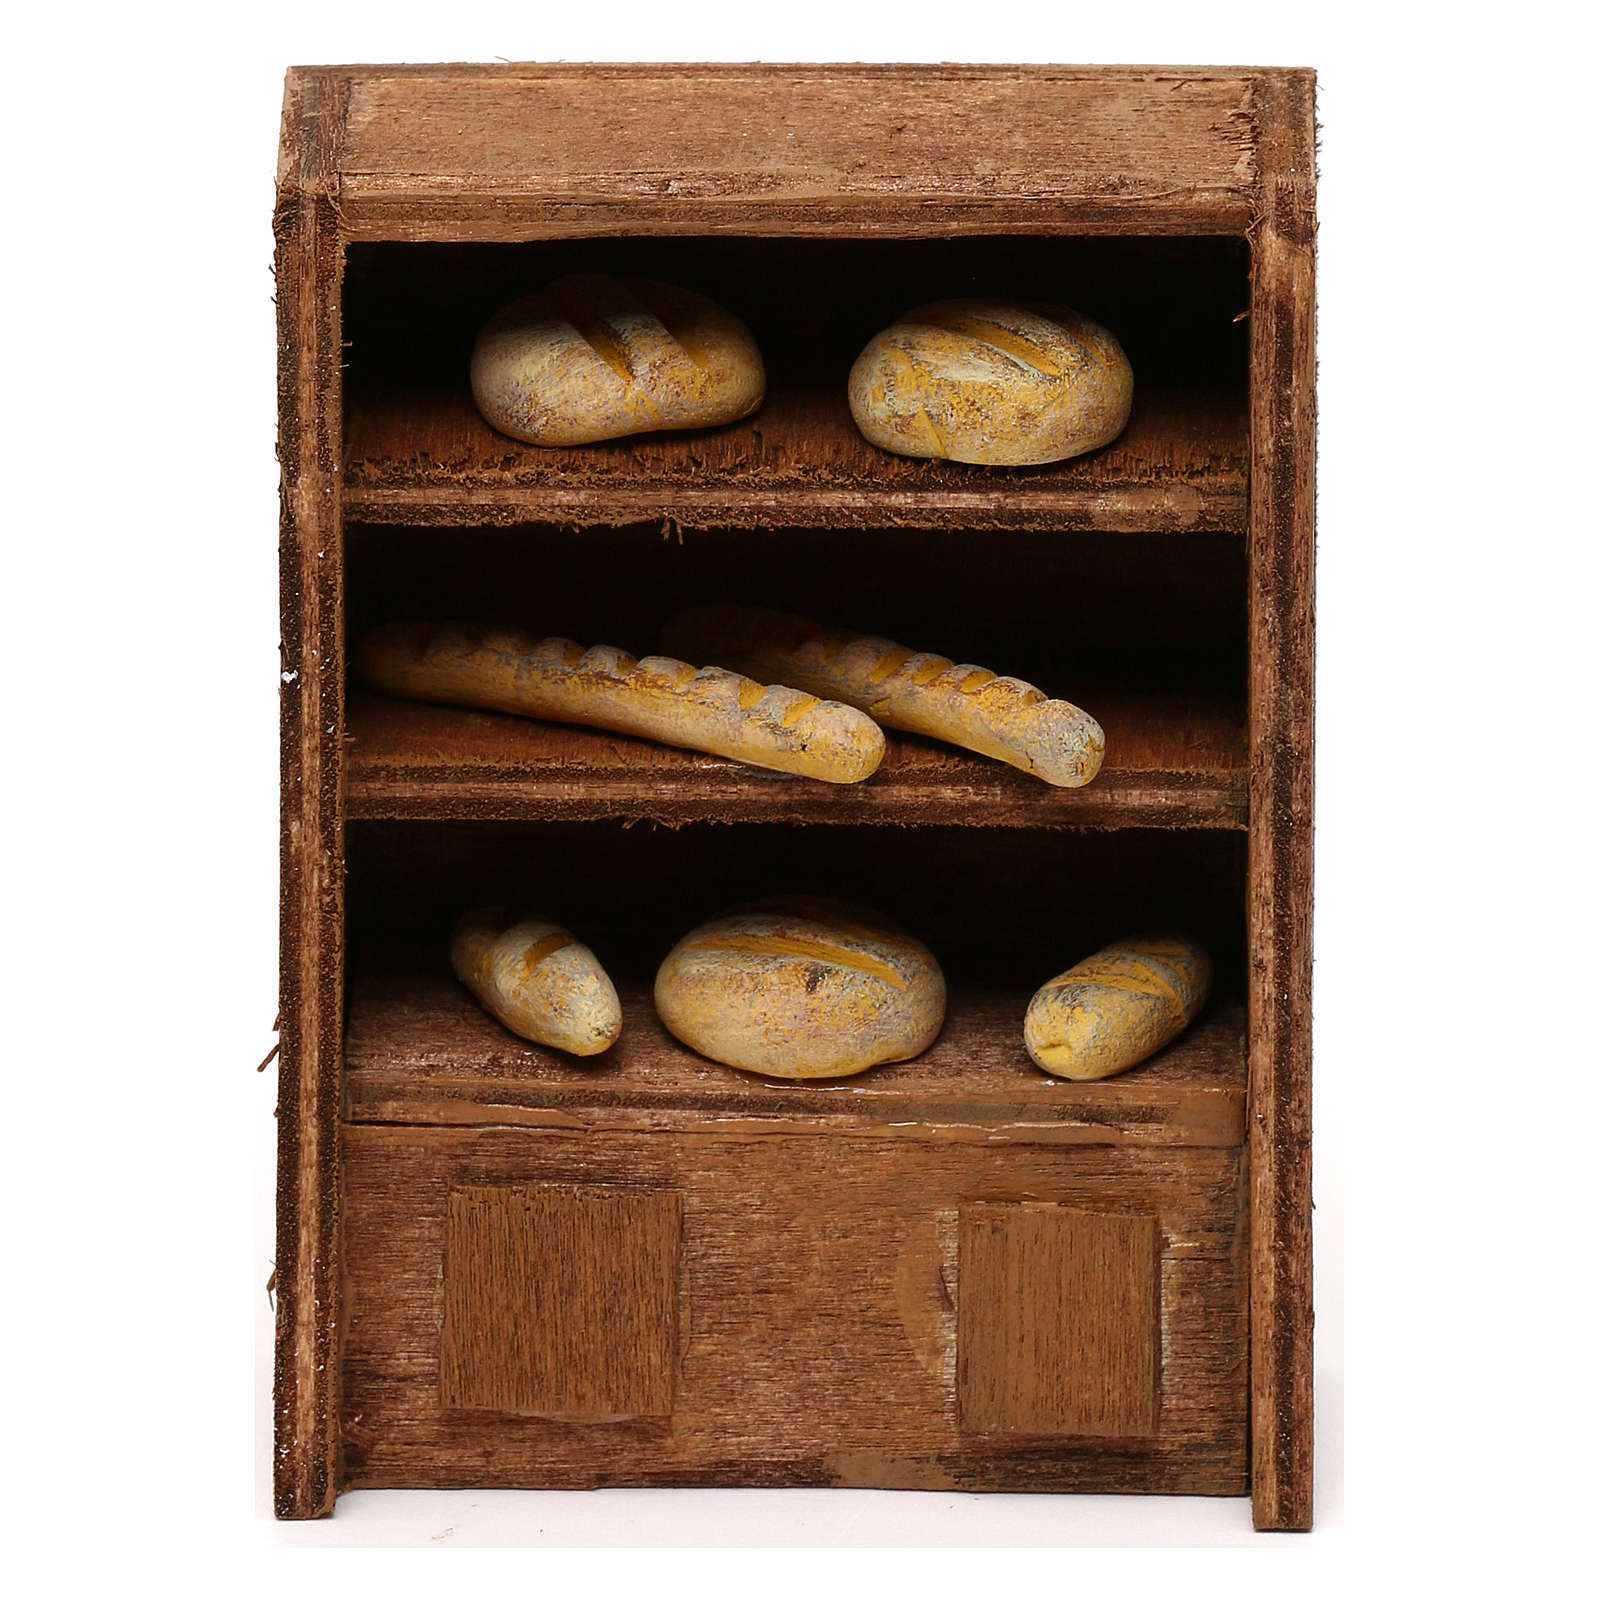 Bread Shelf for nativities 10cm 4